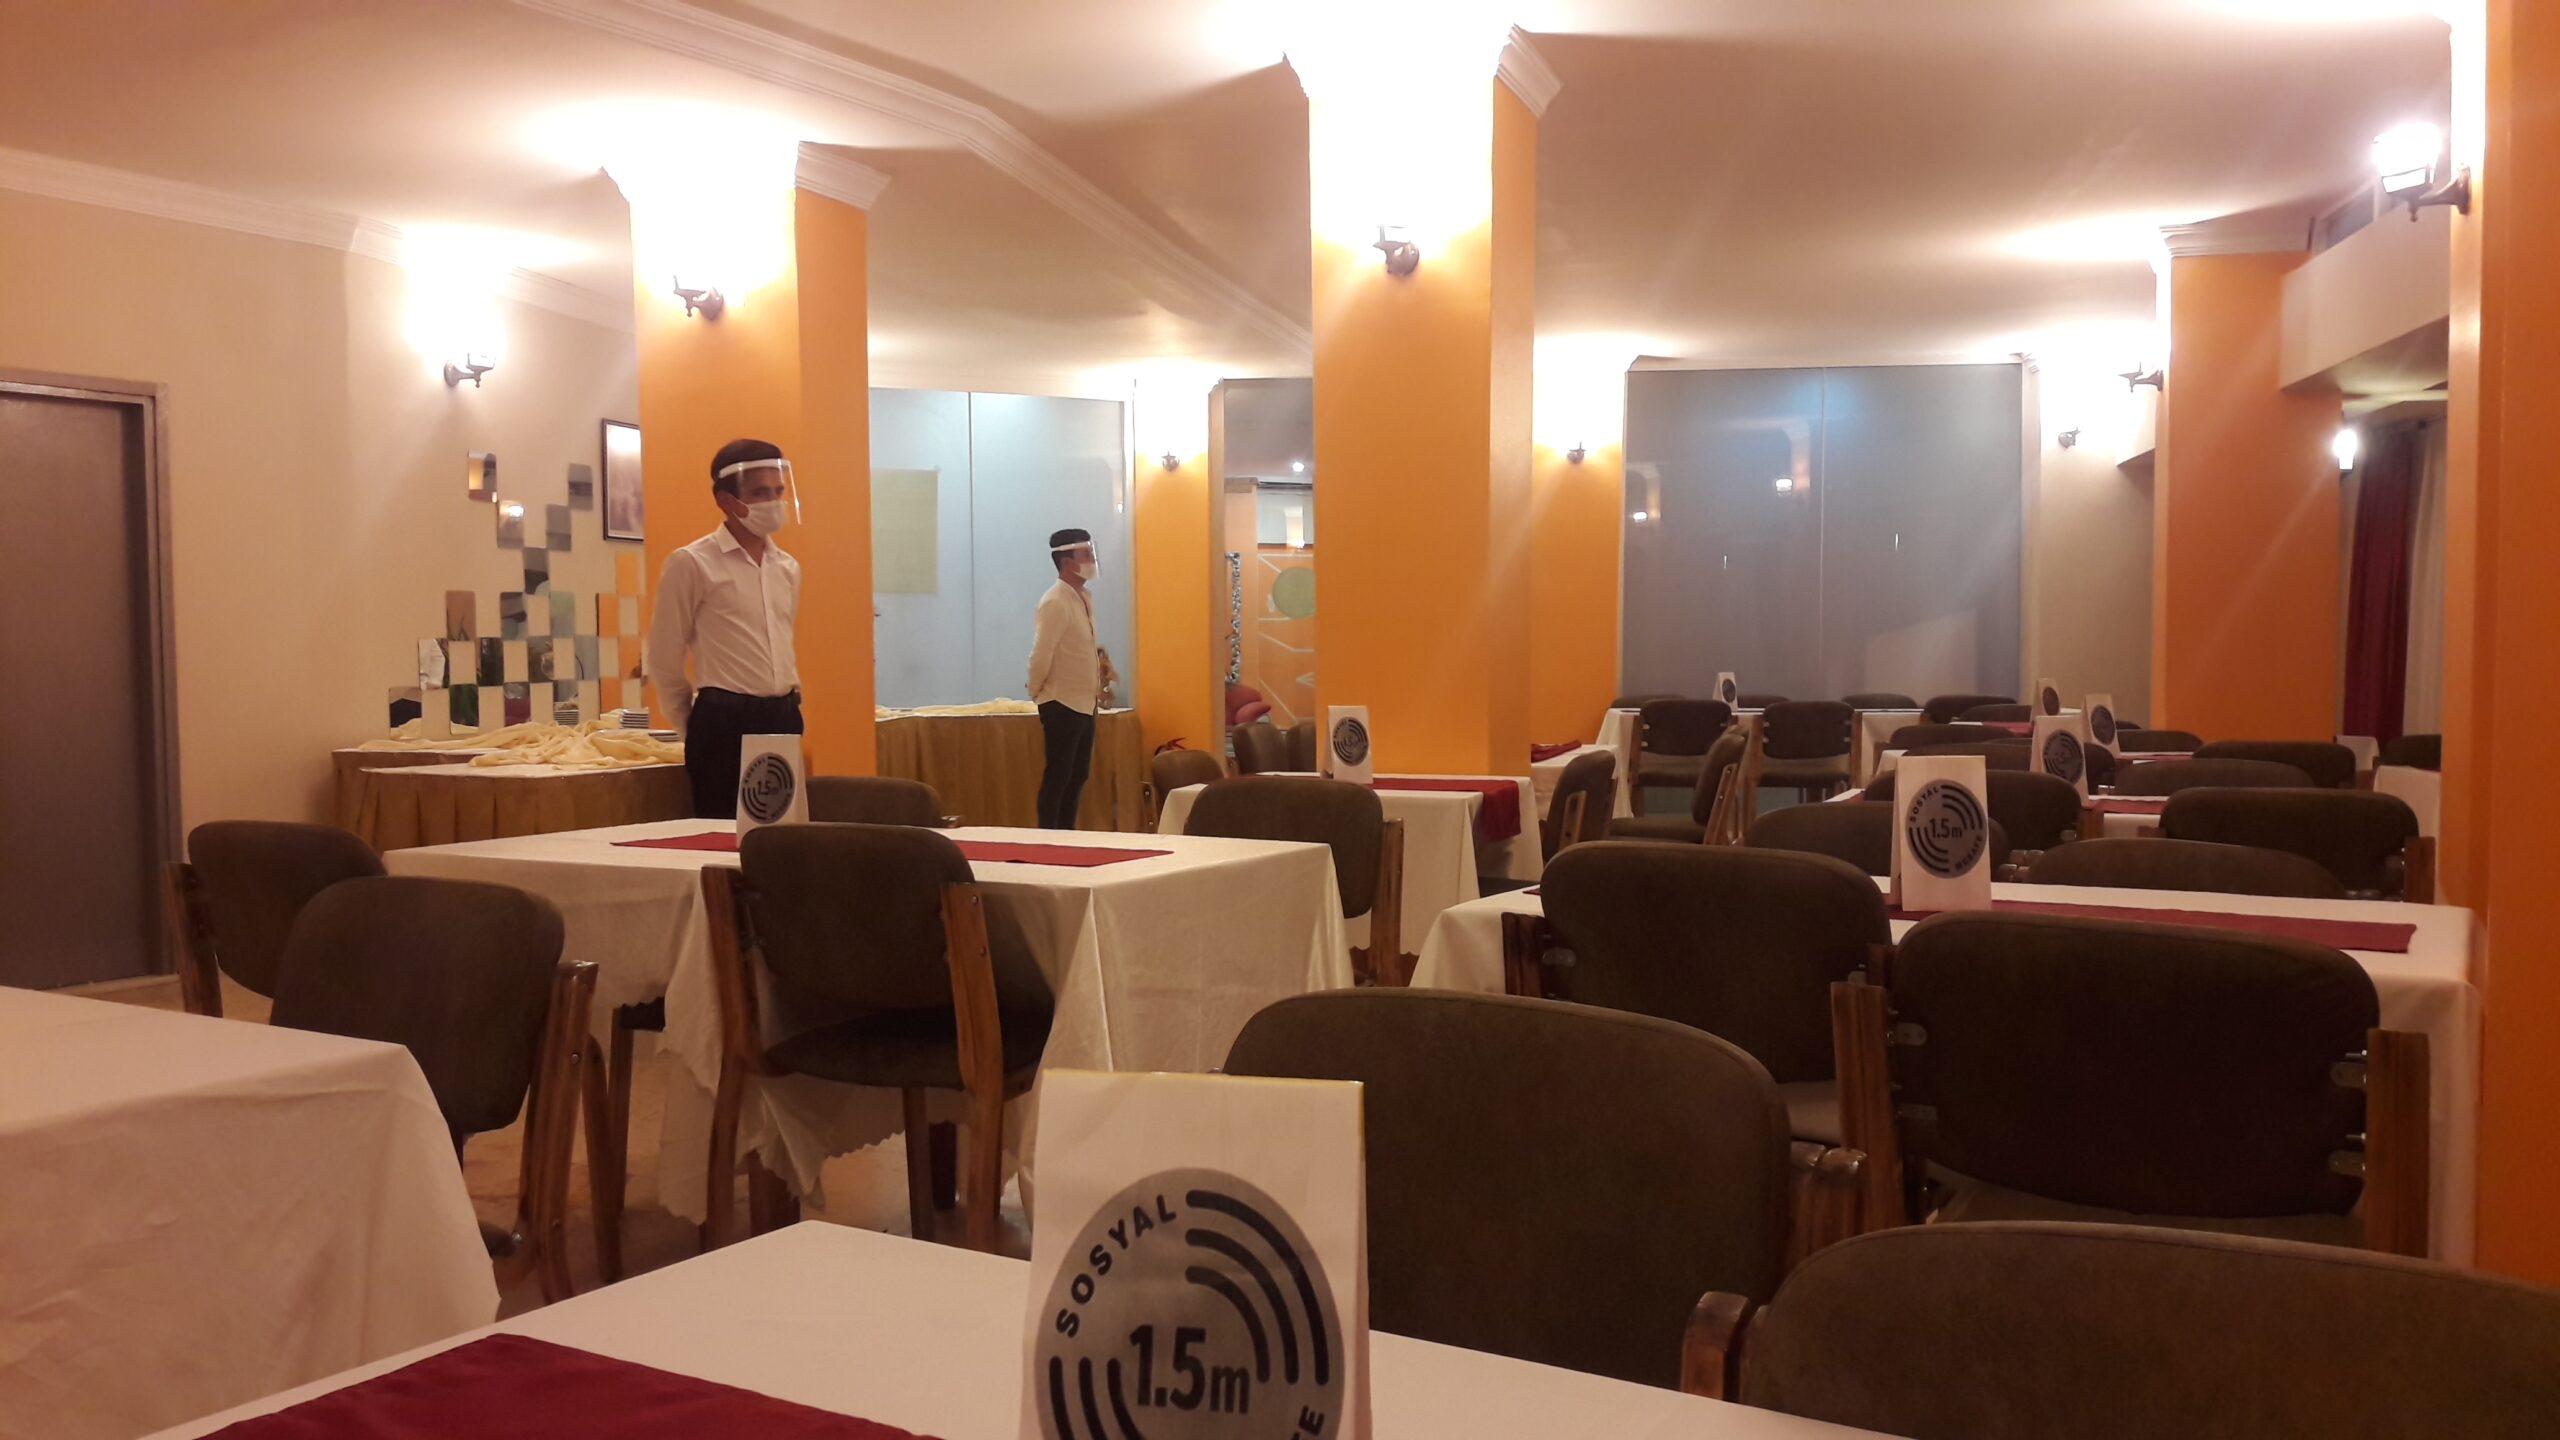 Letovanje Turska autobusom, Sarimsakli, Hotel Urgenc,restoran